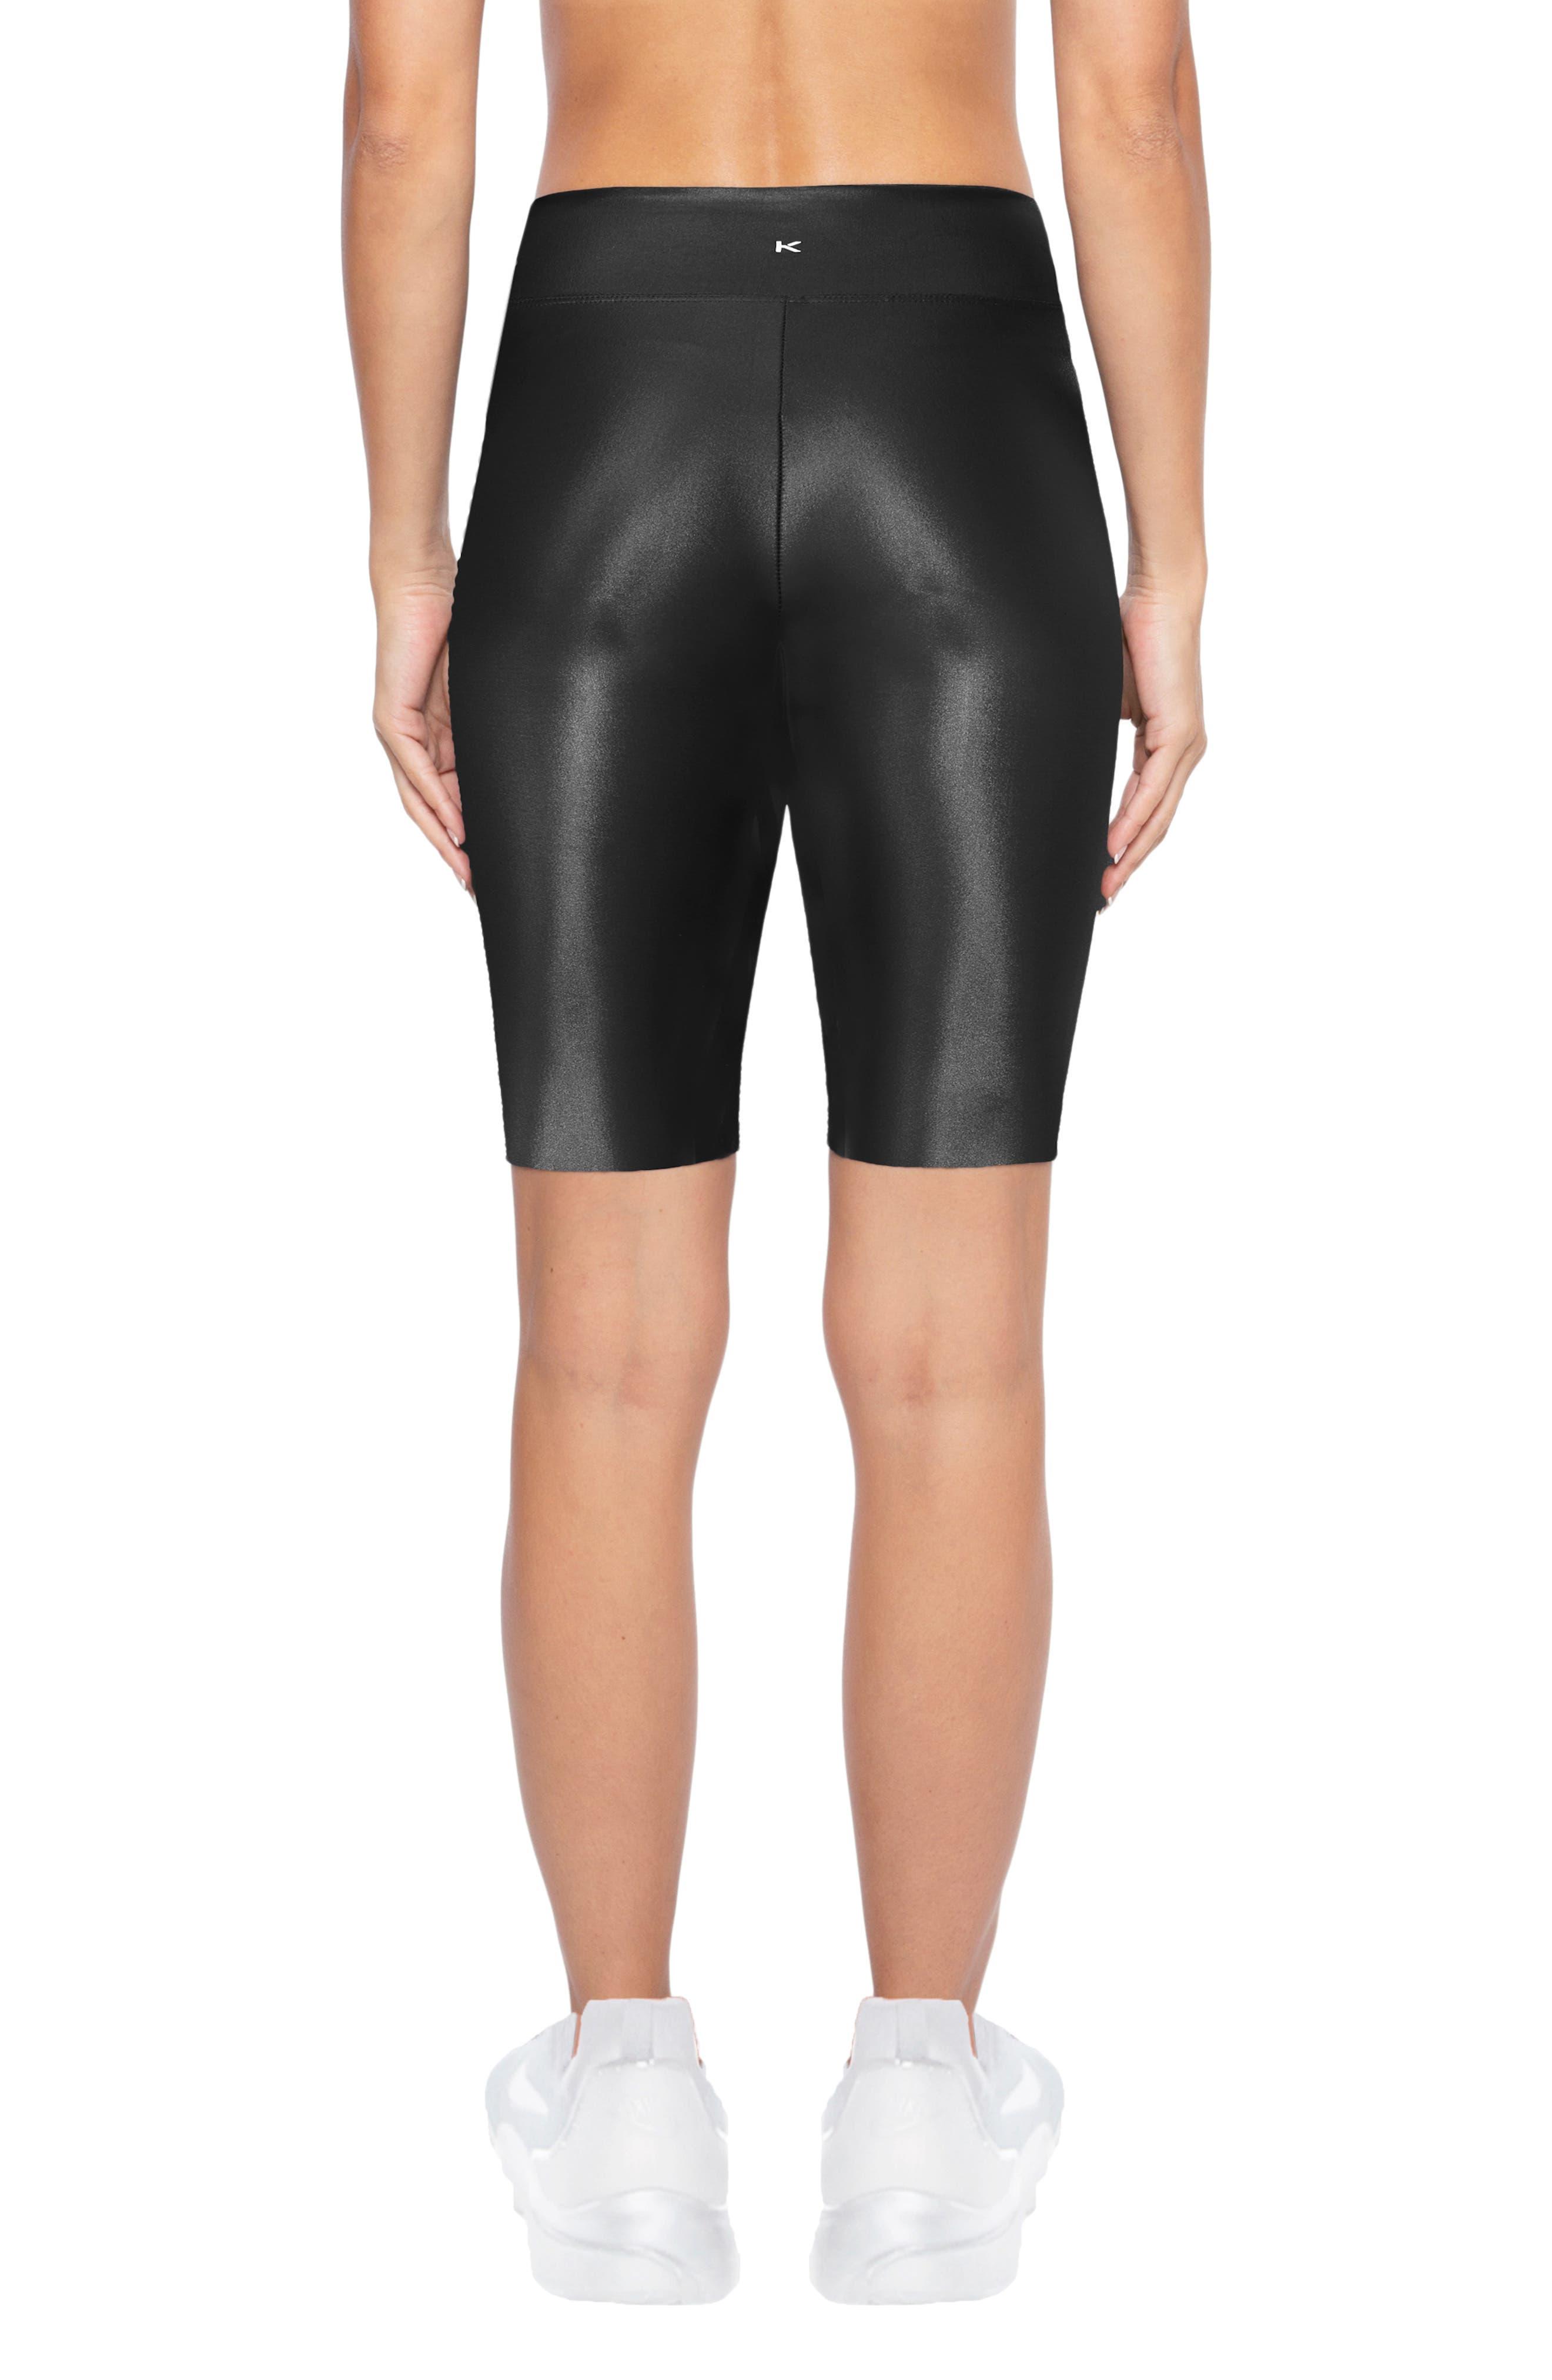 Densonic High Waist Bike Shorts,                             Alternate thumbnail 2, color,                             BLACK